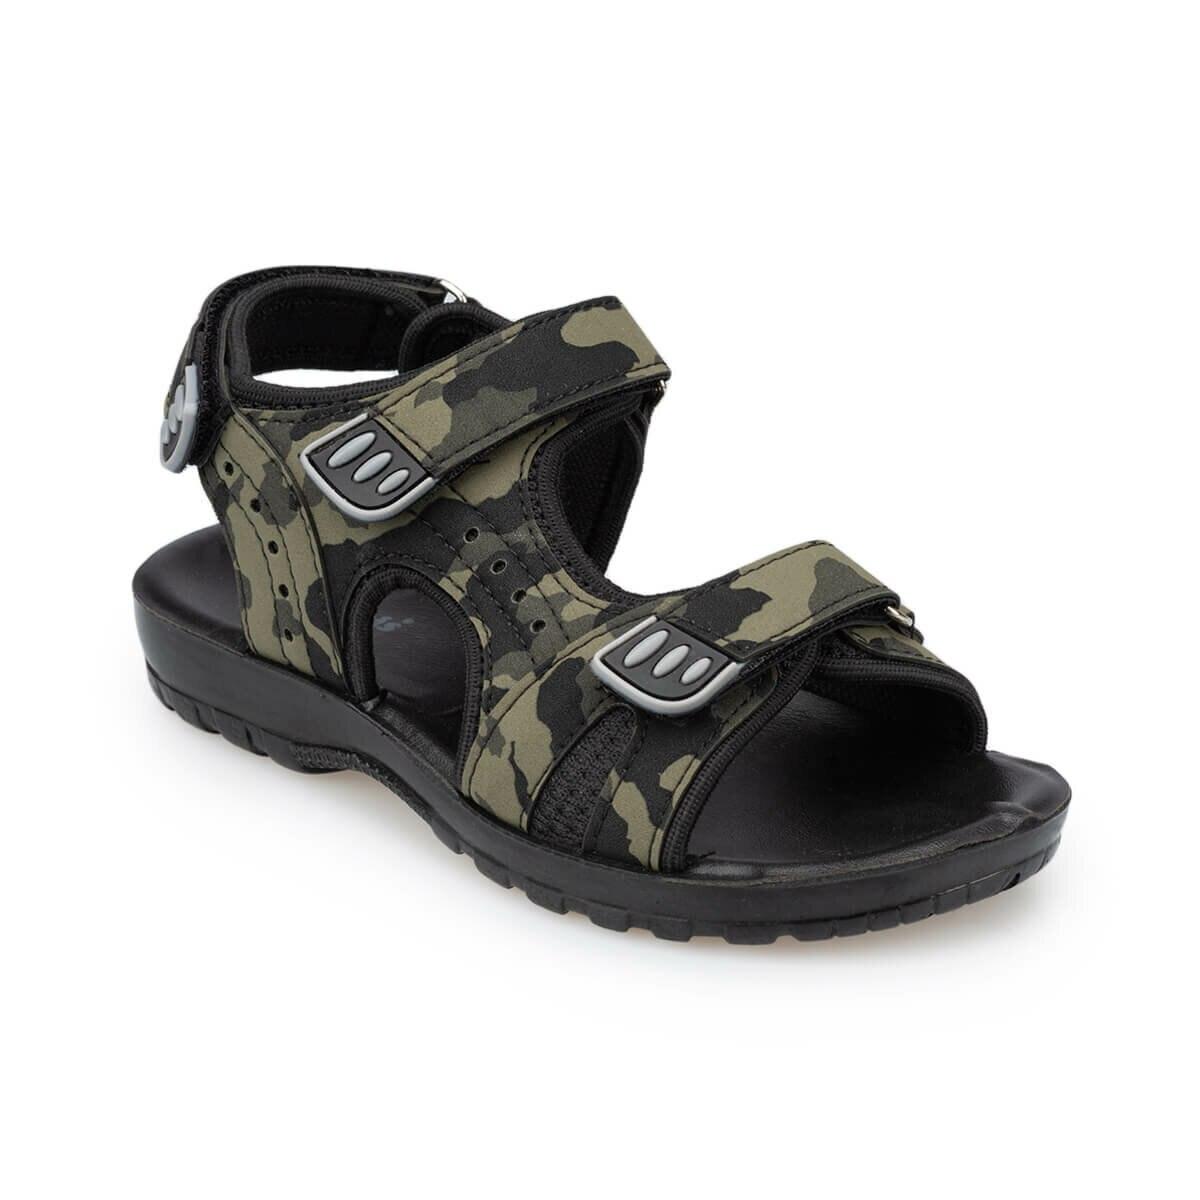 FLO 91. 511346.G Green Male Child Sandals Polaris